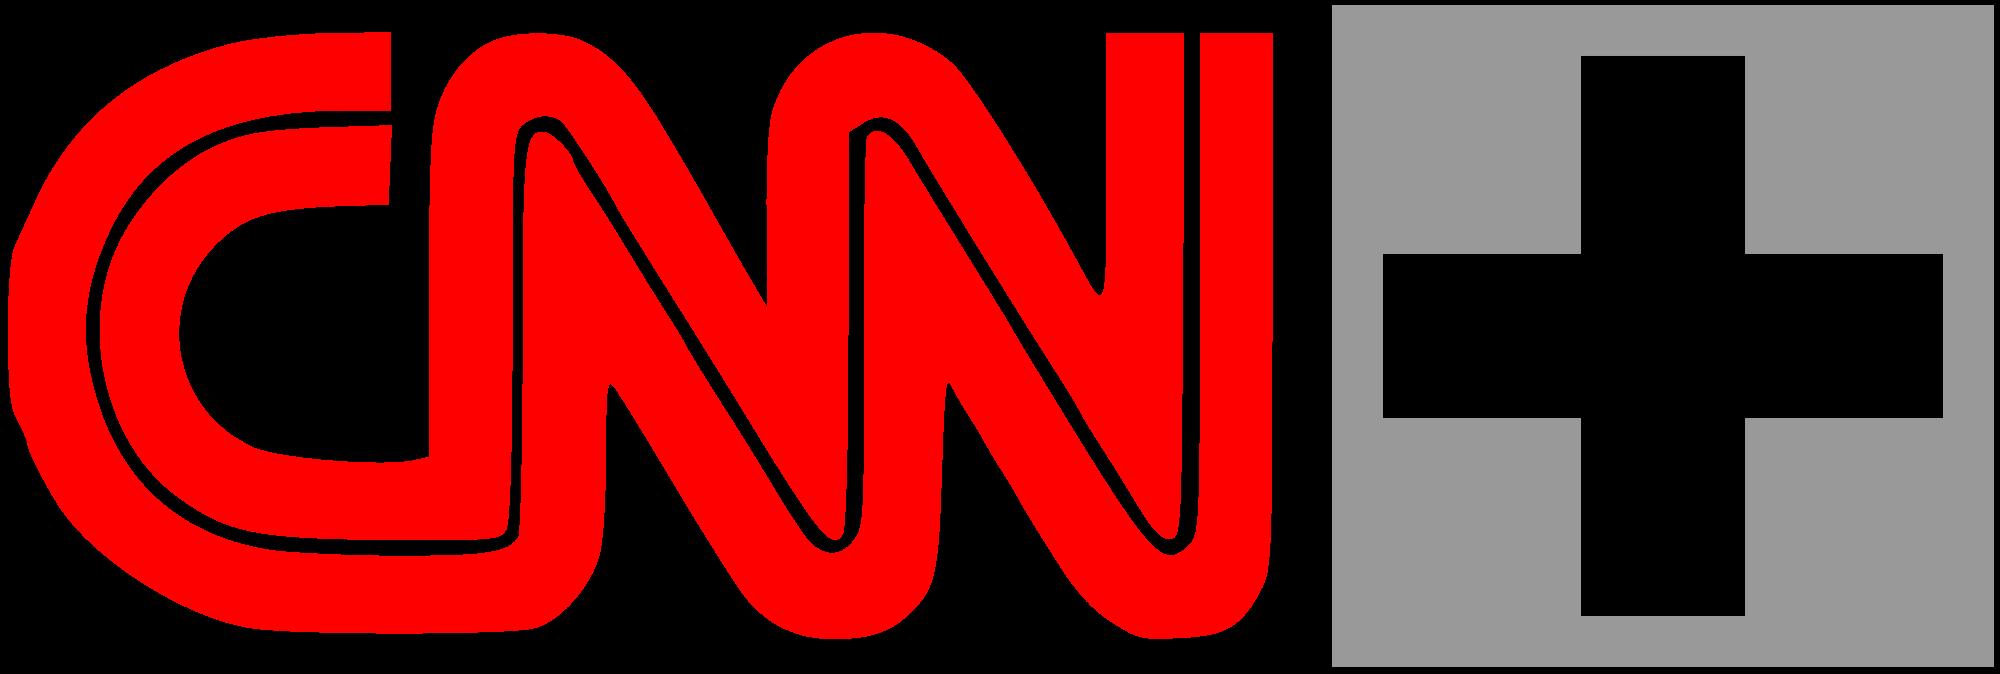 cnn logo png free transparent png logos rh freepnglogos com cnn vector logo download cnn vector logo download